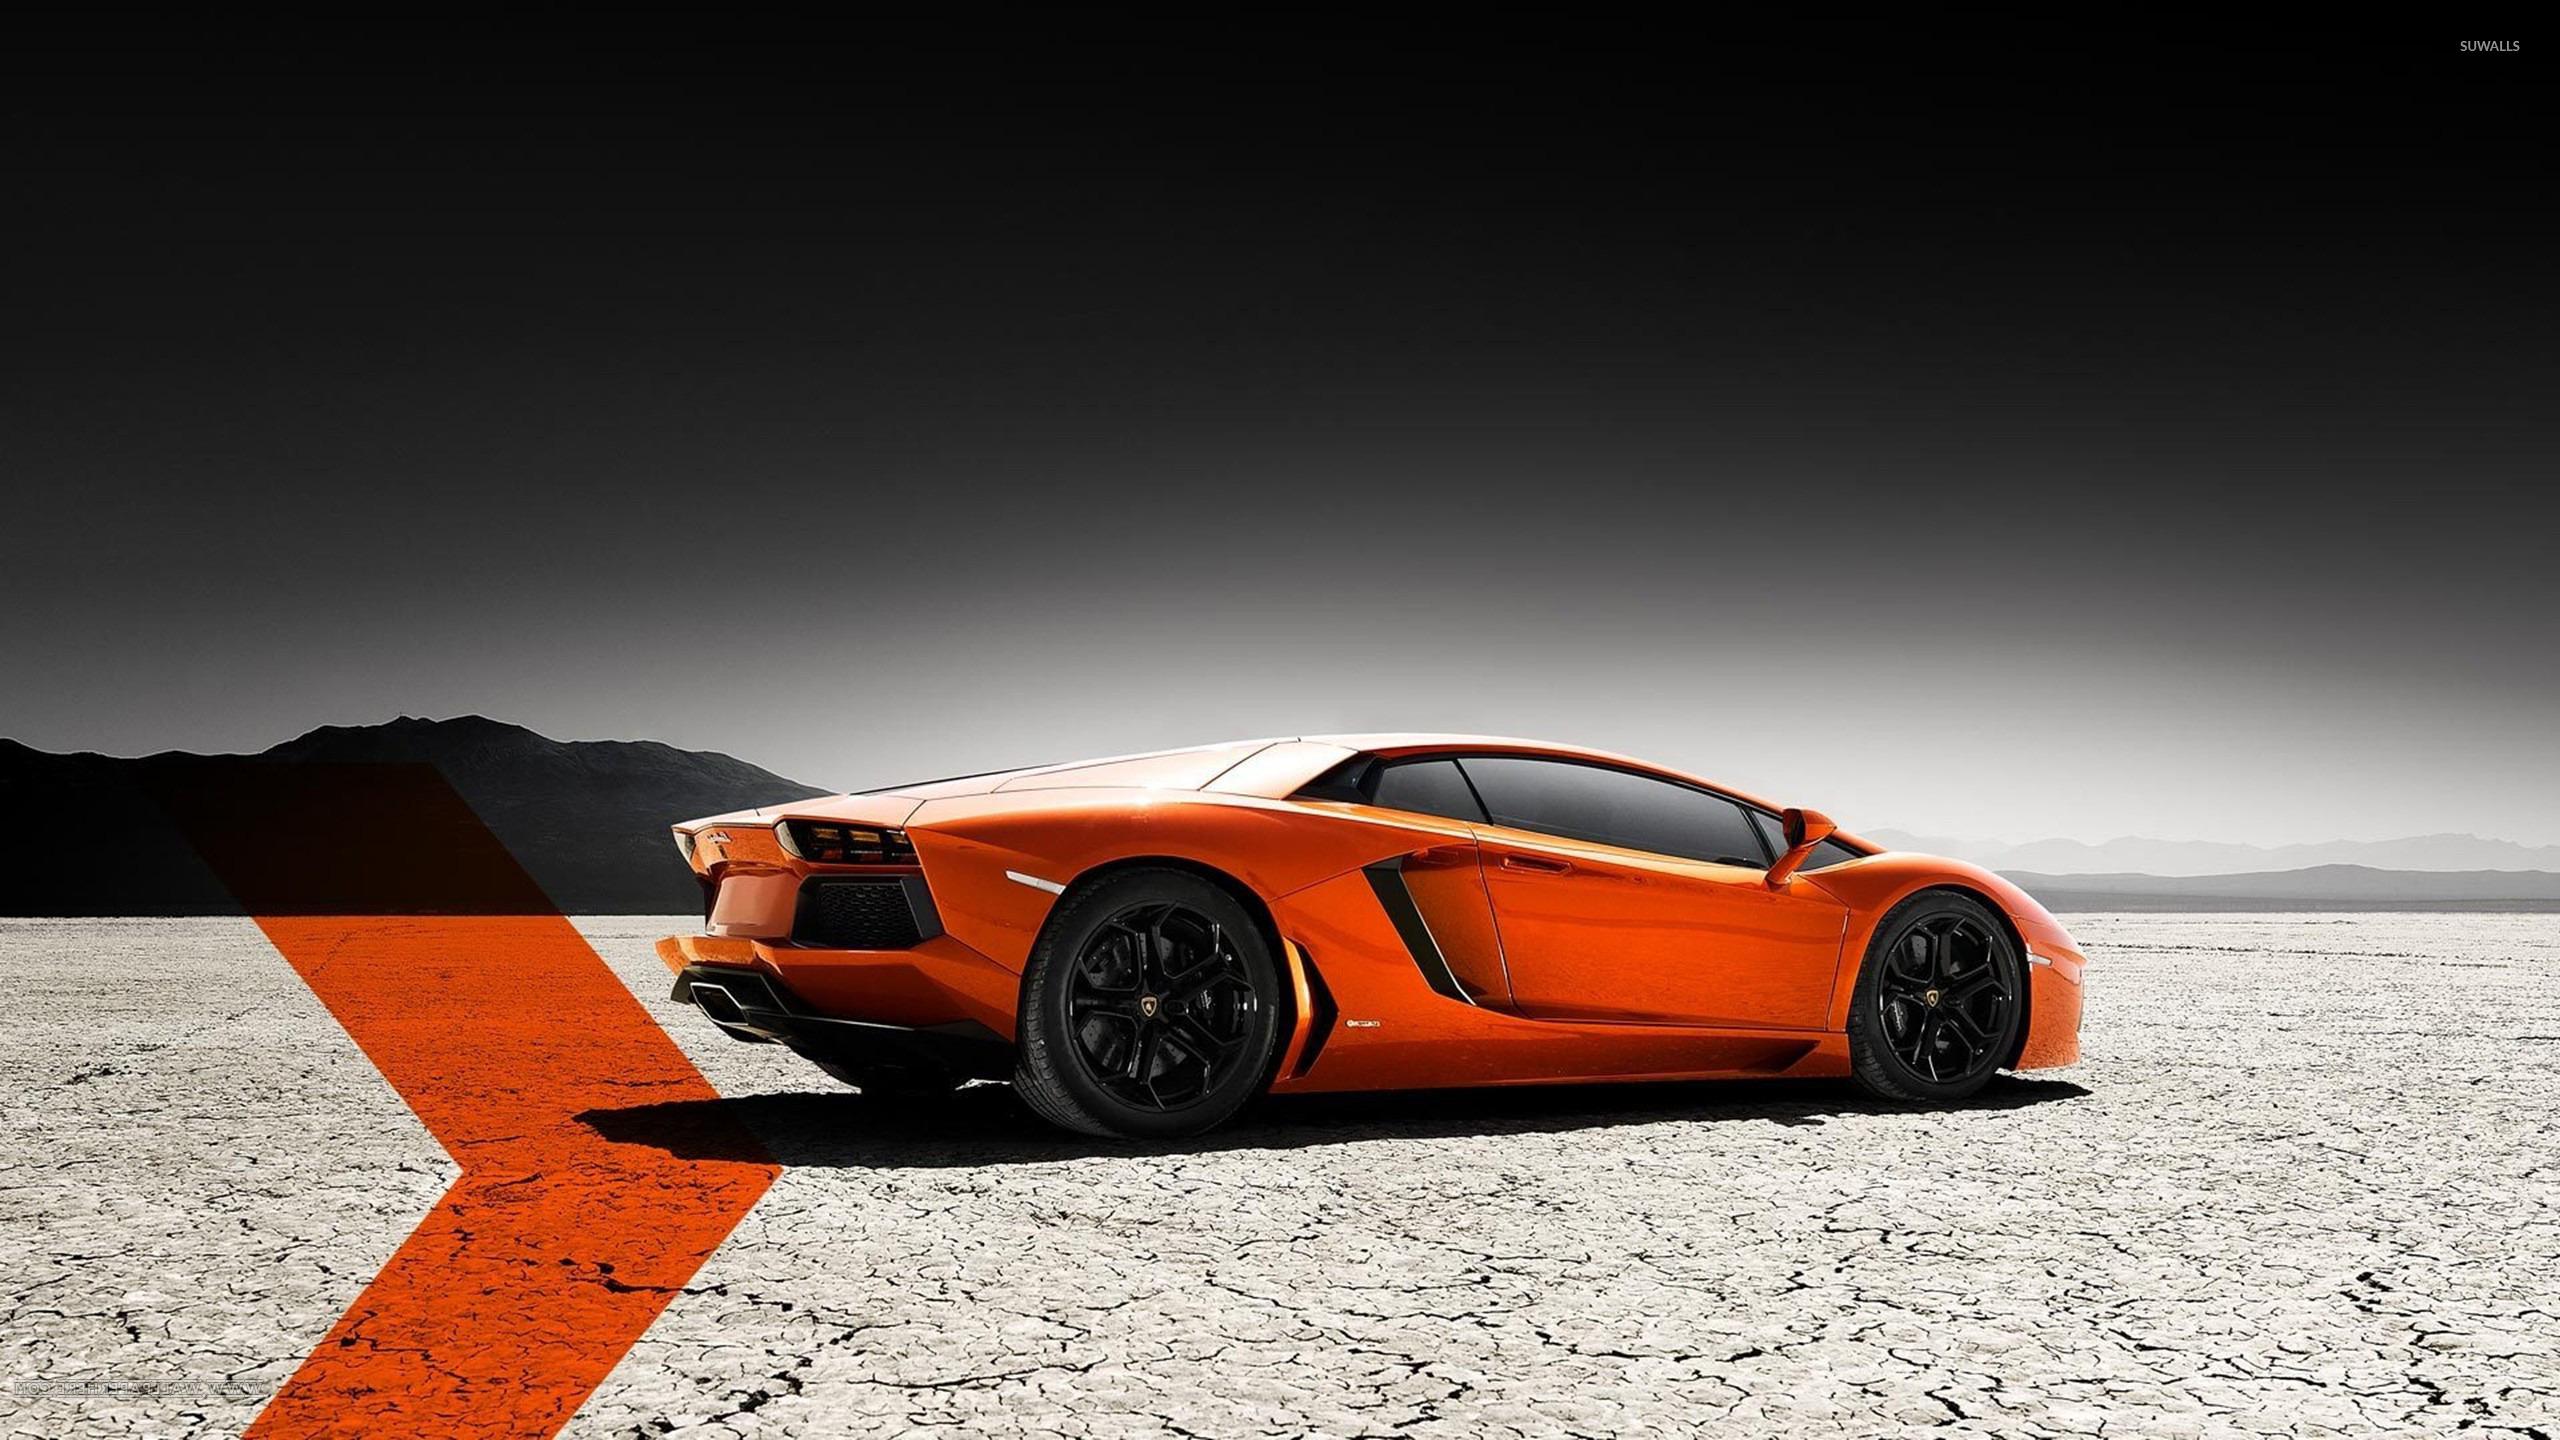 Lamborghini Aventador [2] Wallpaper